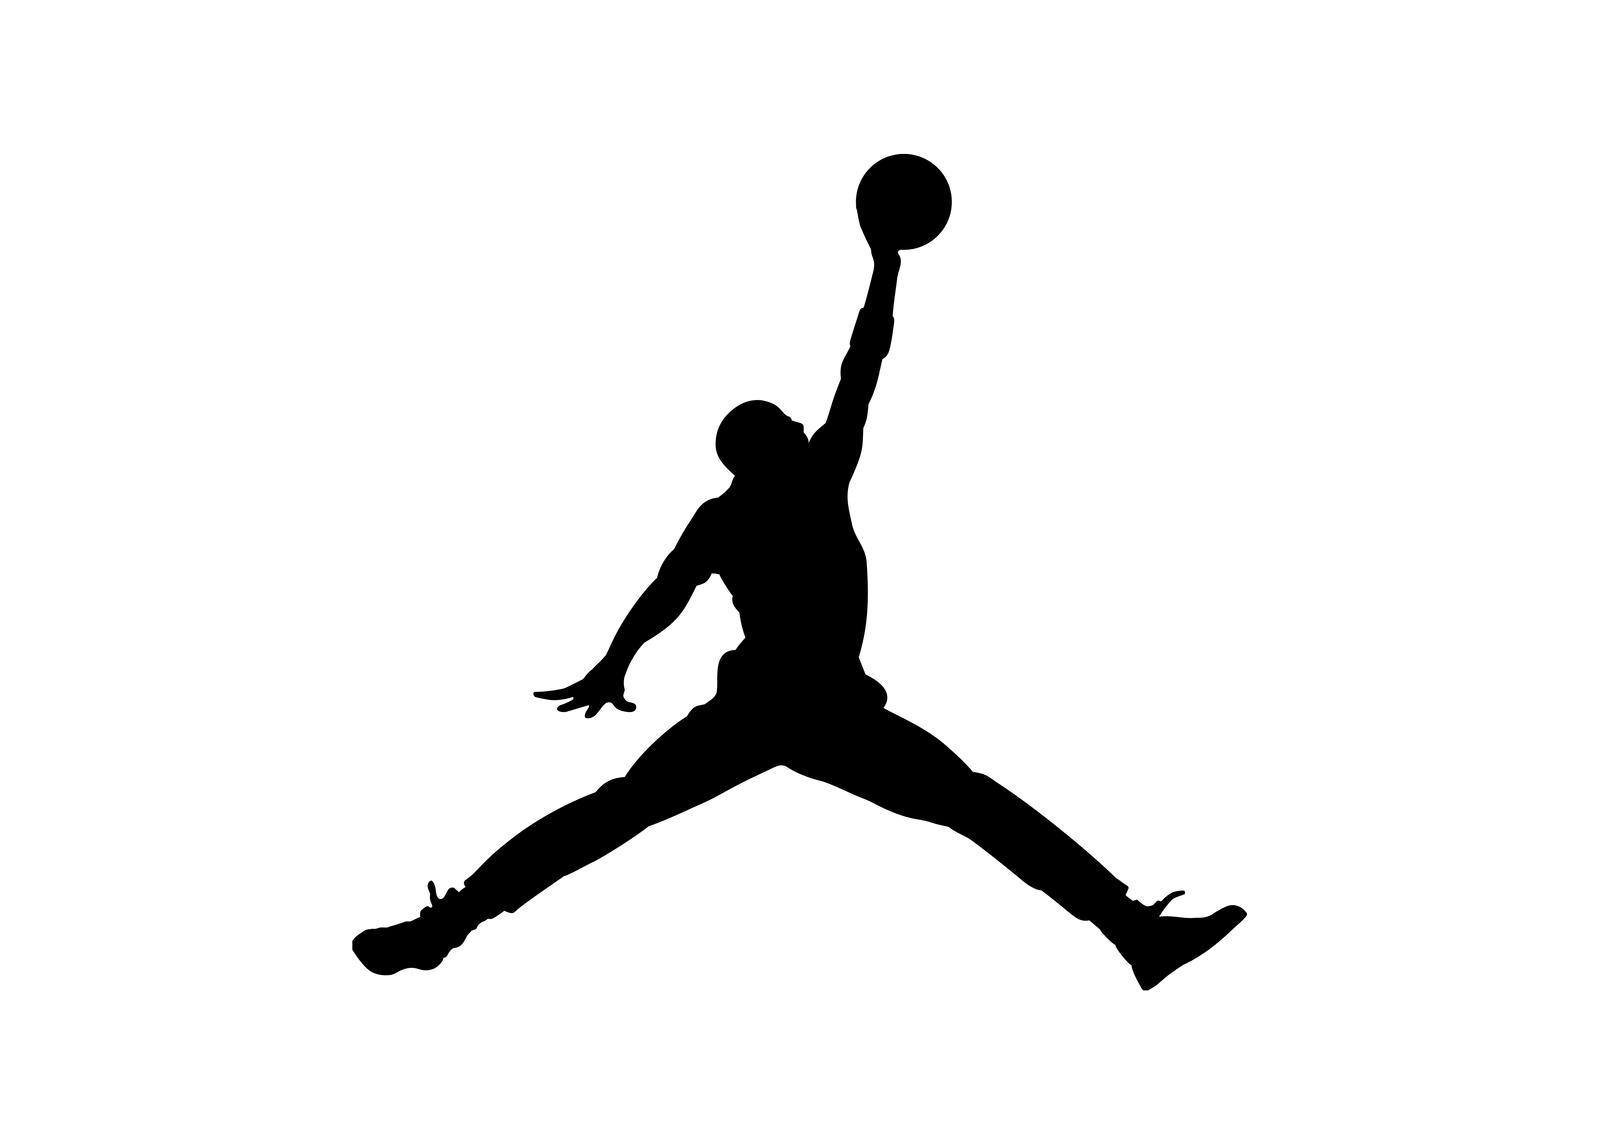 The Jordan Brand logo